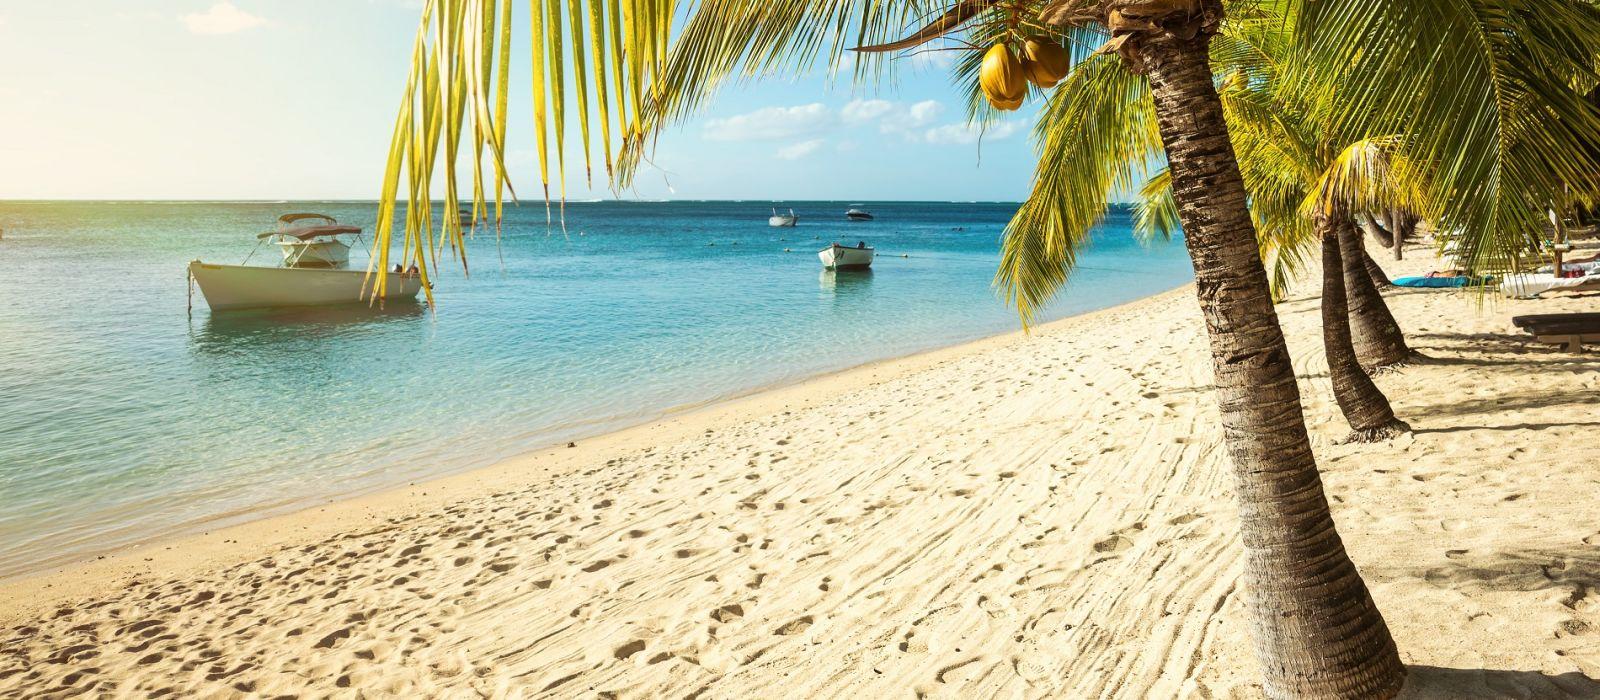 Mauritius Tours & Trips